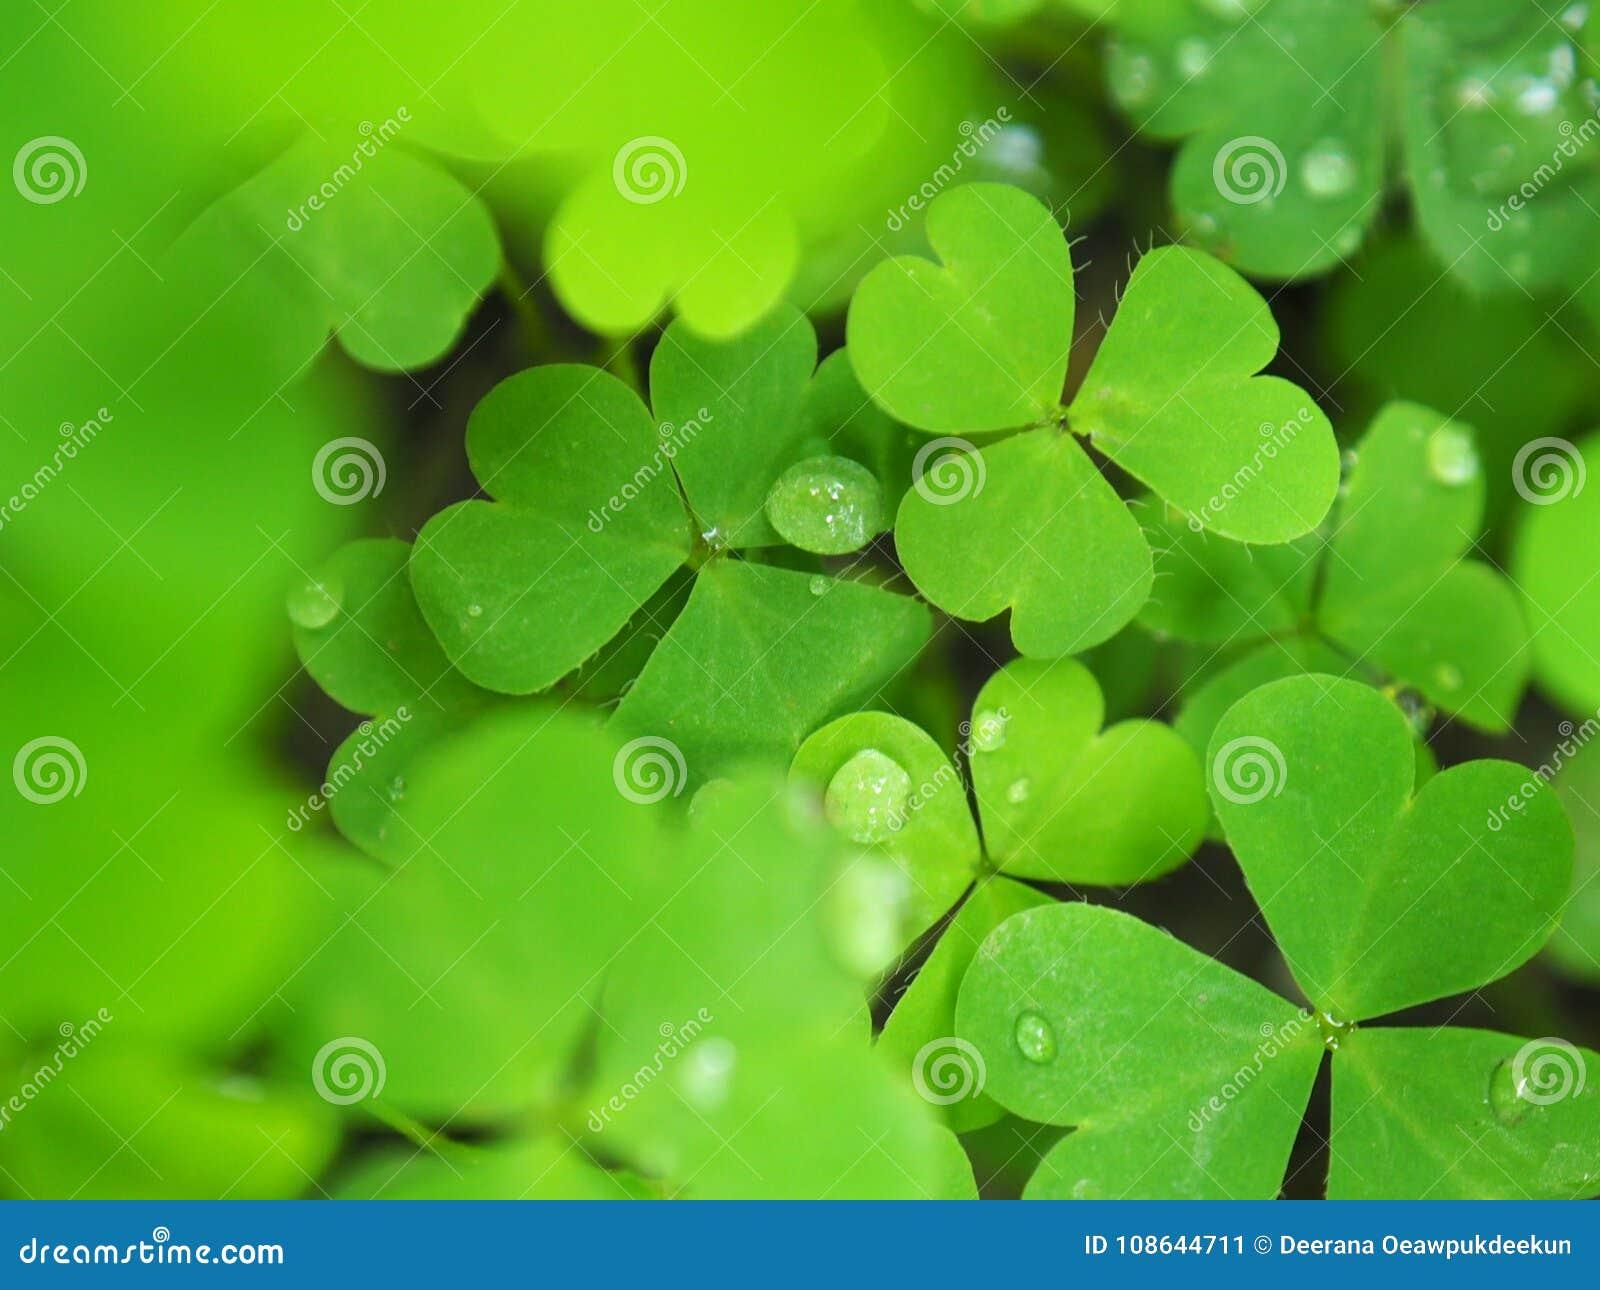 bedeutung grünes herz